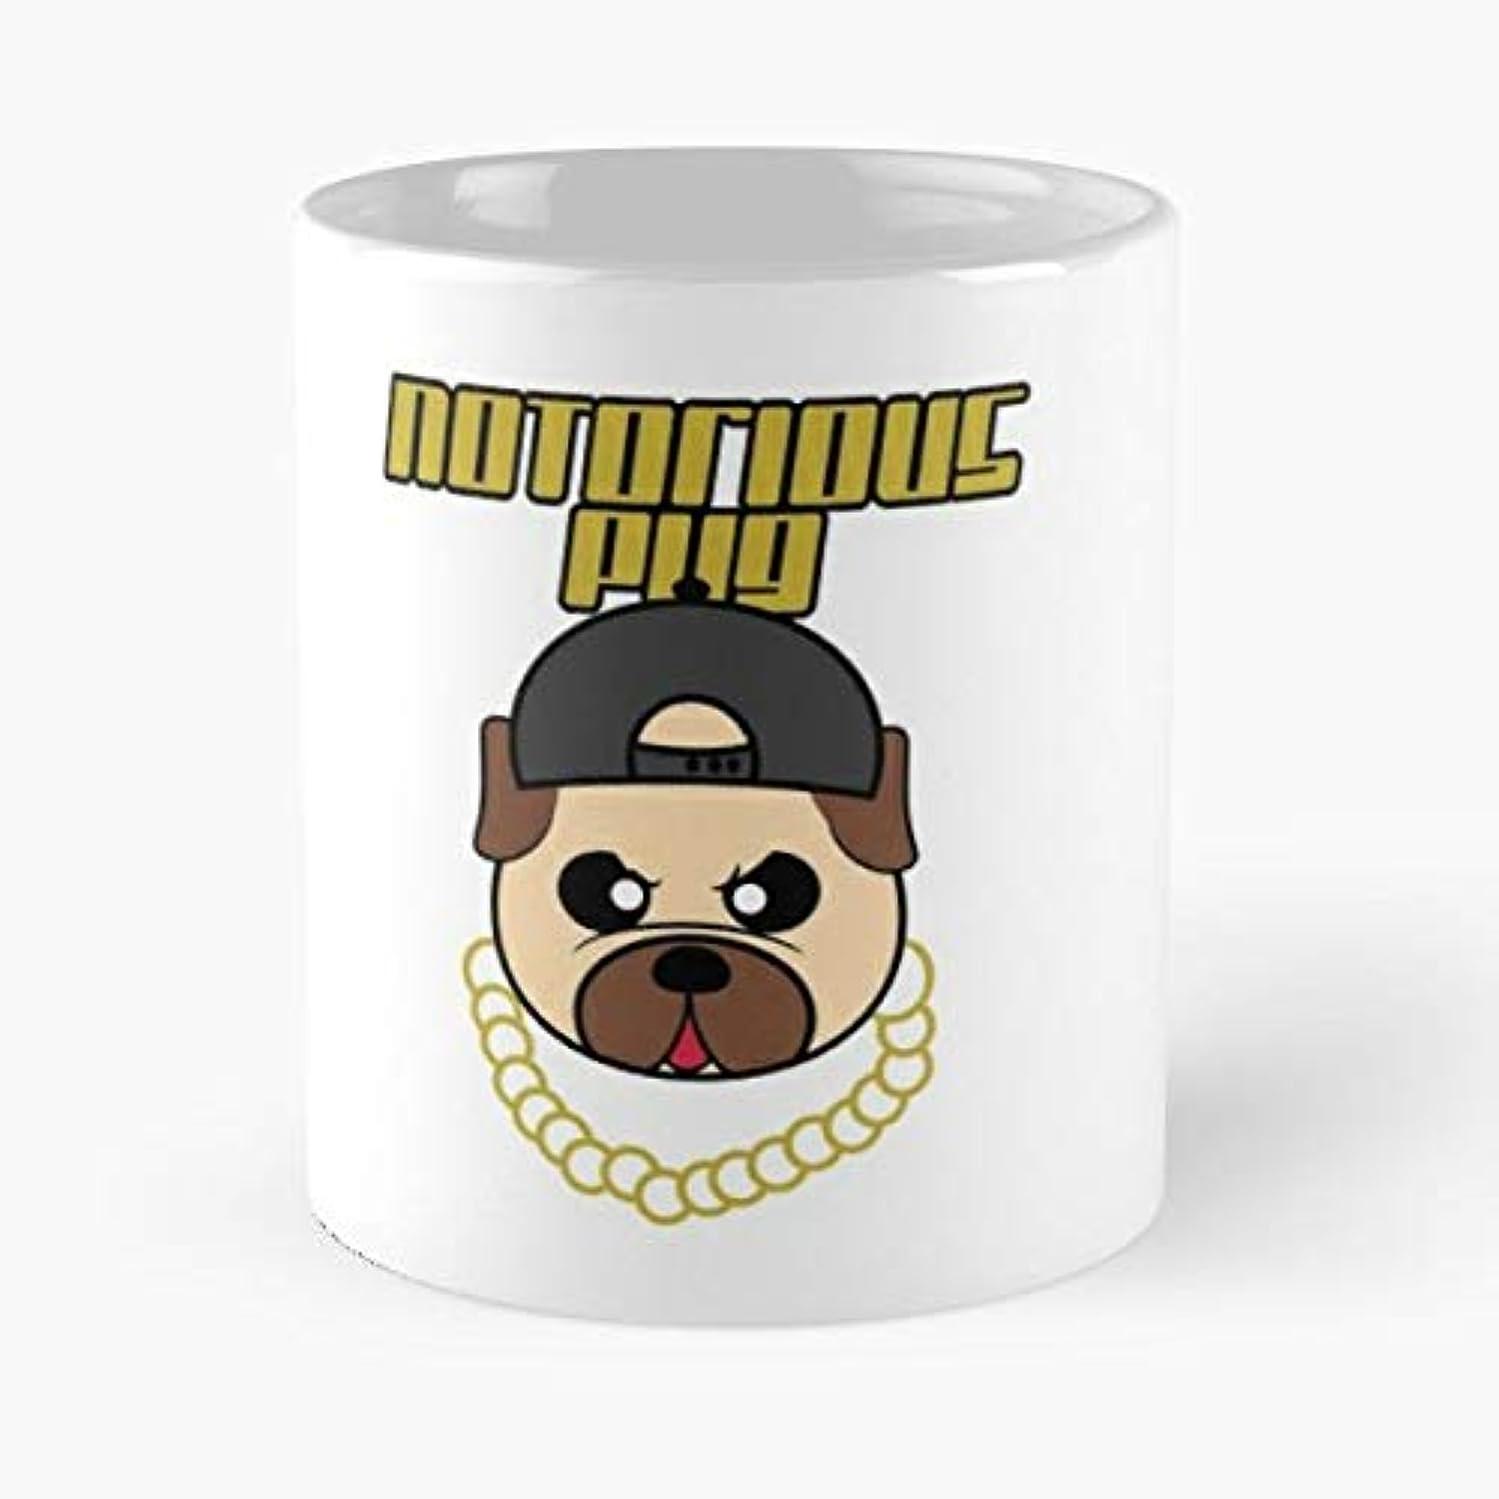 Pug Dog Animal Pet - Coffee Mug Best Gift 11 Oz Father Day